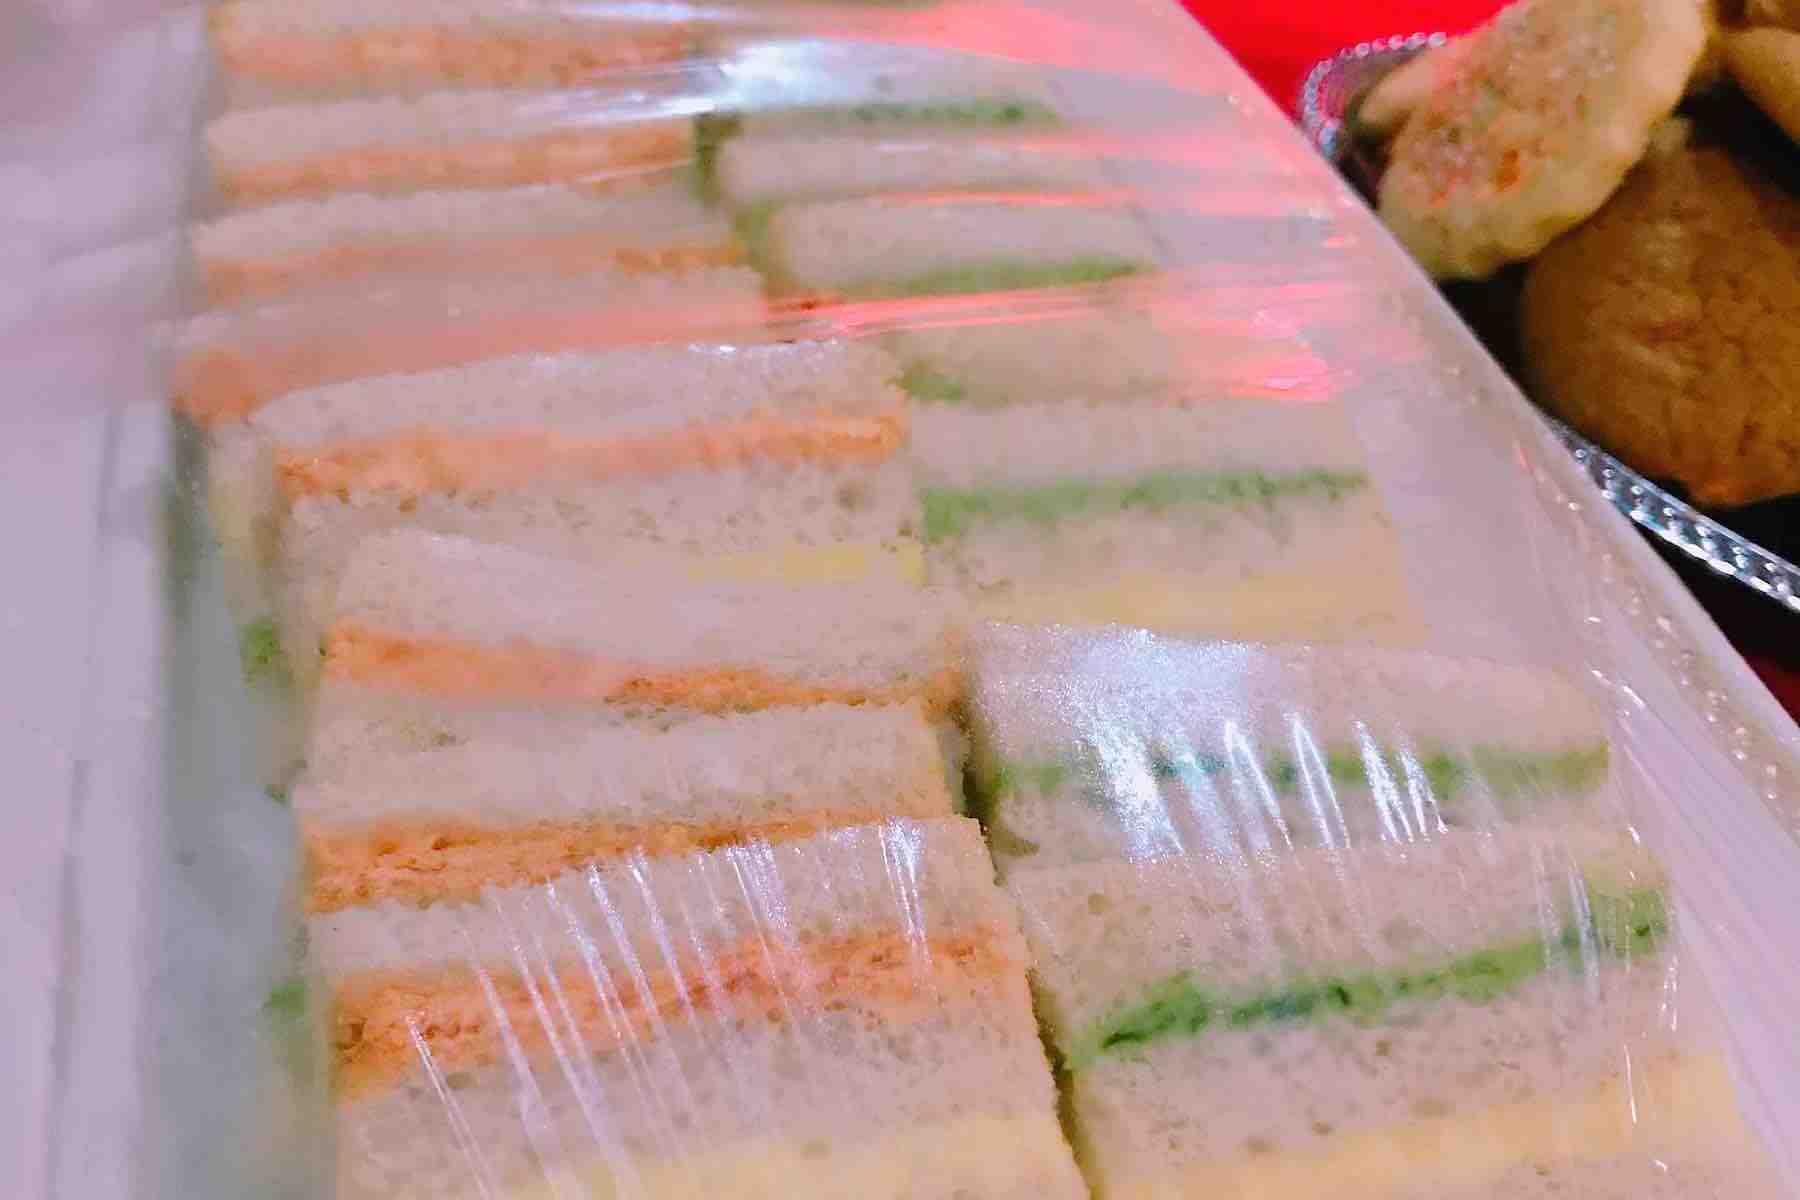 South African Rainbow Bread